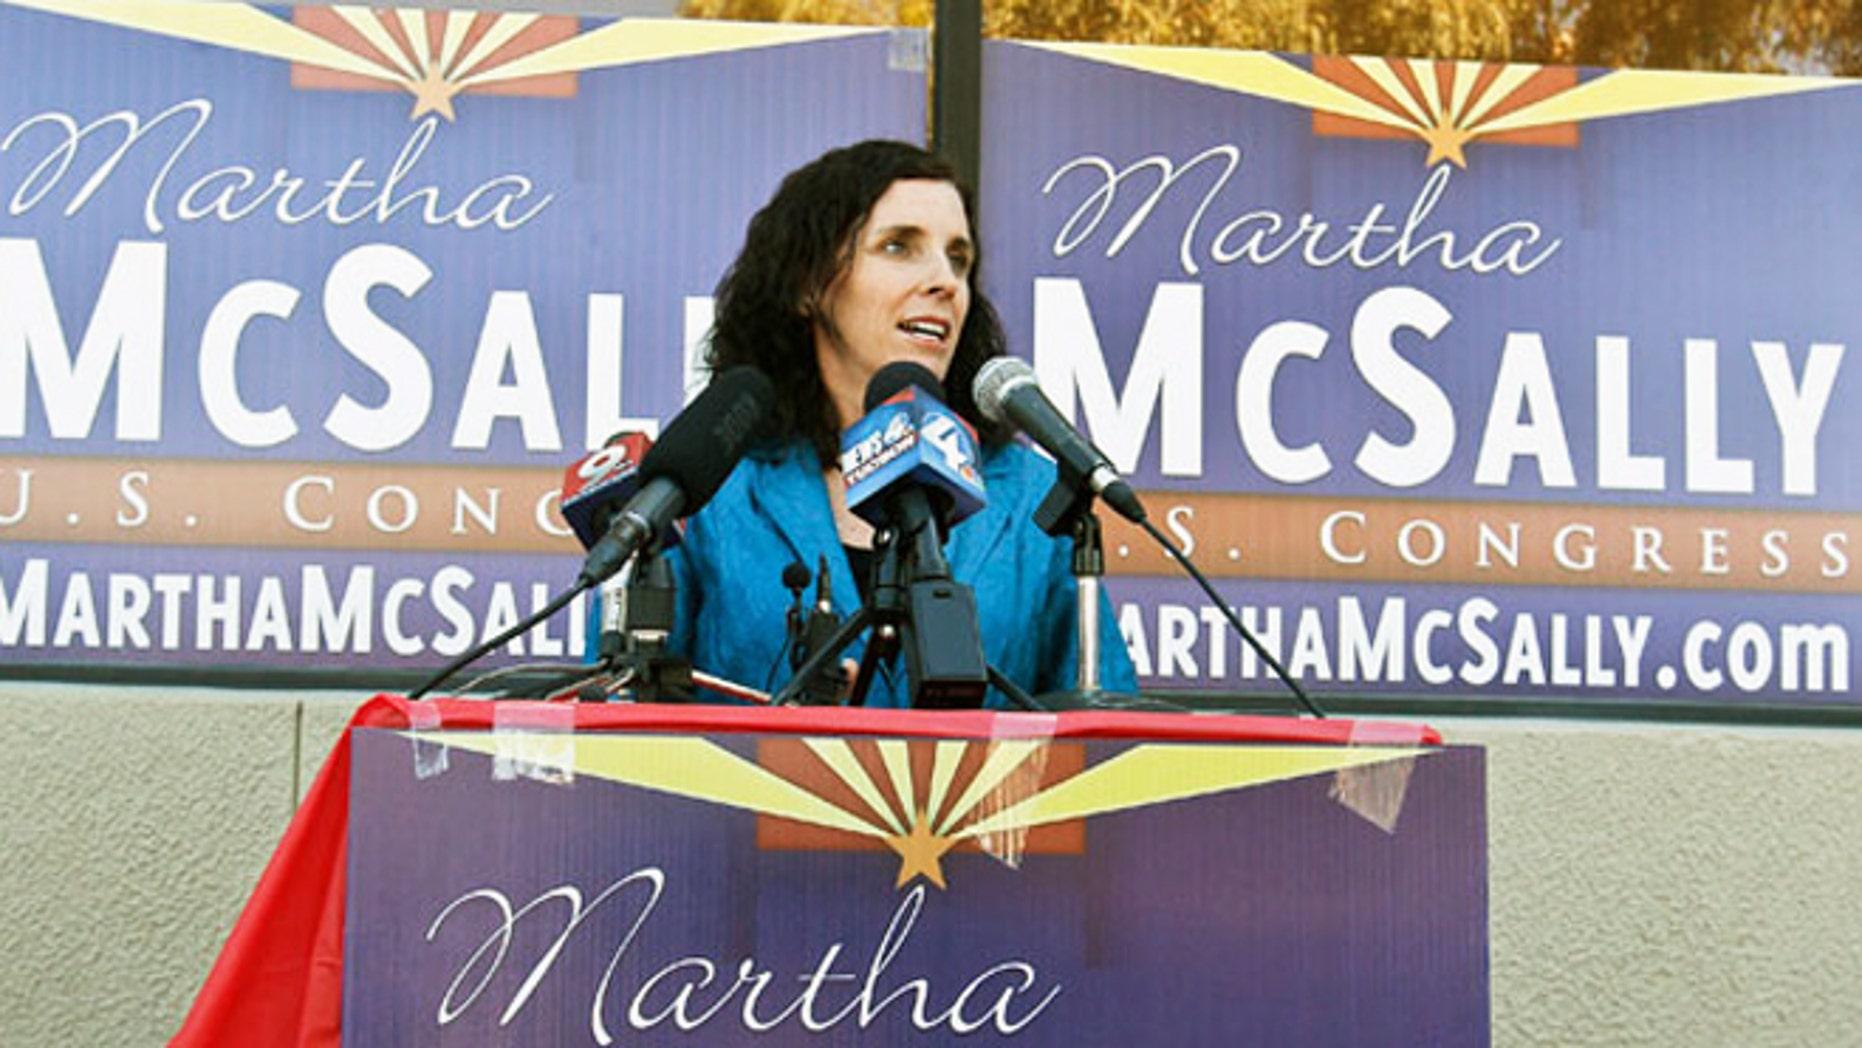 Republican candidate for Congress Martha McSally